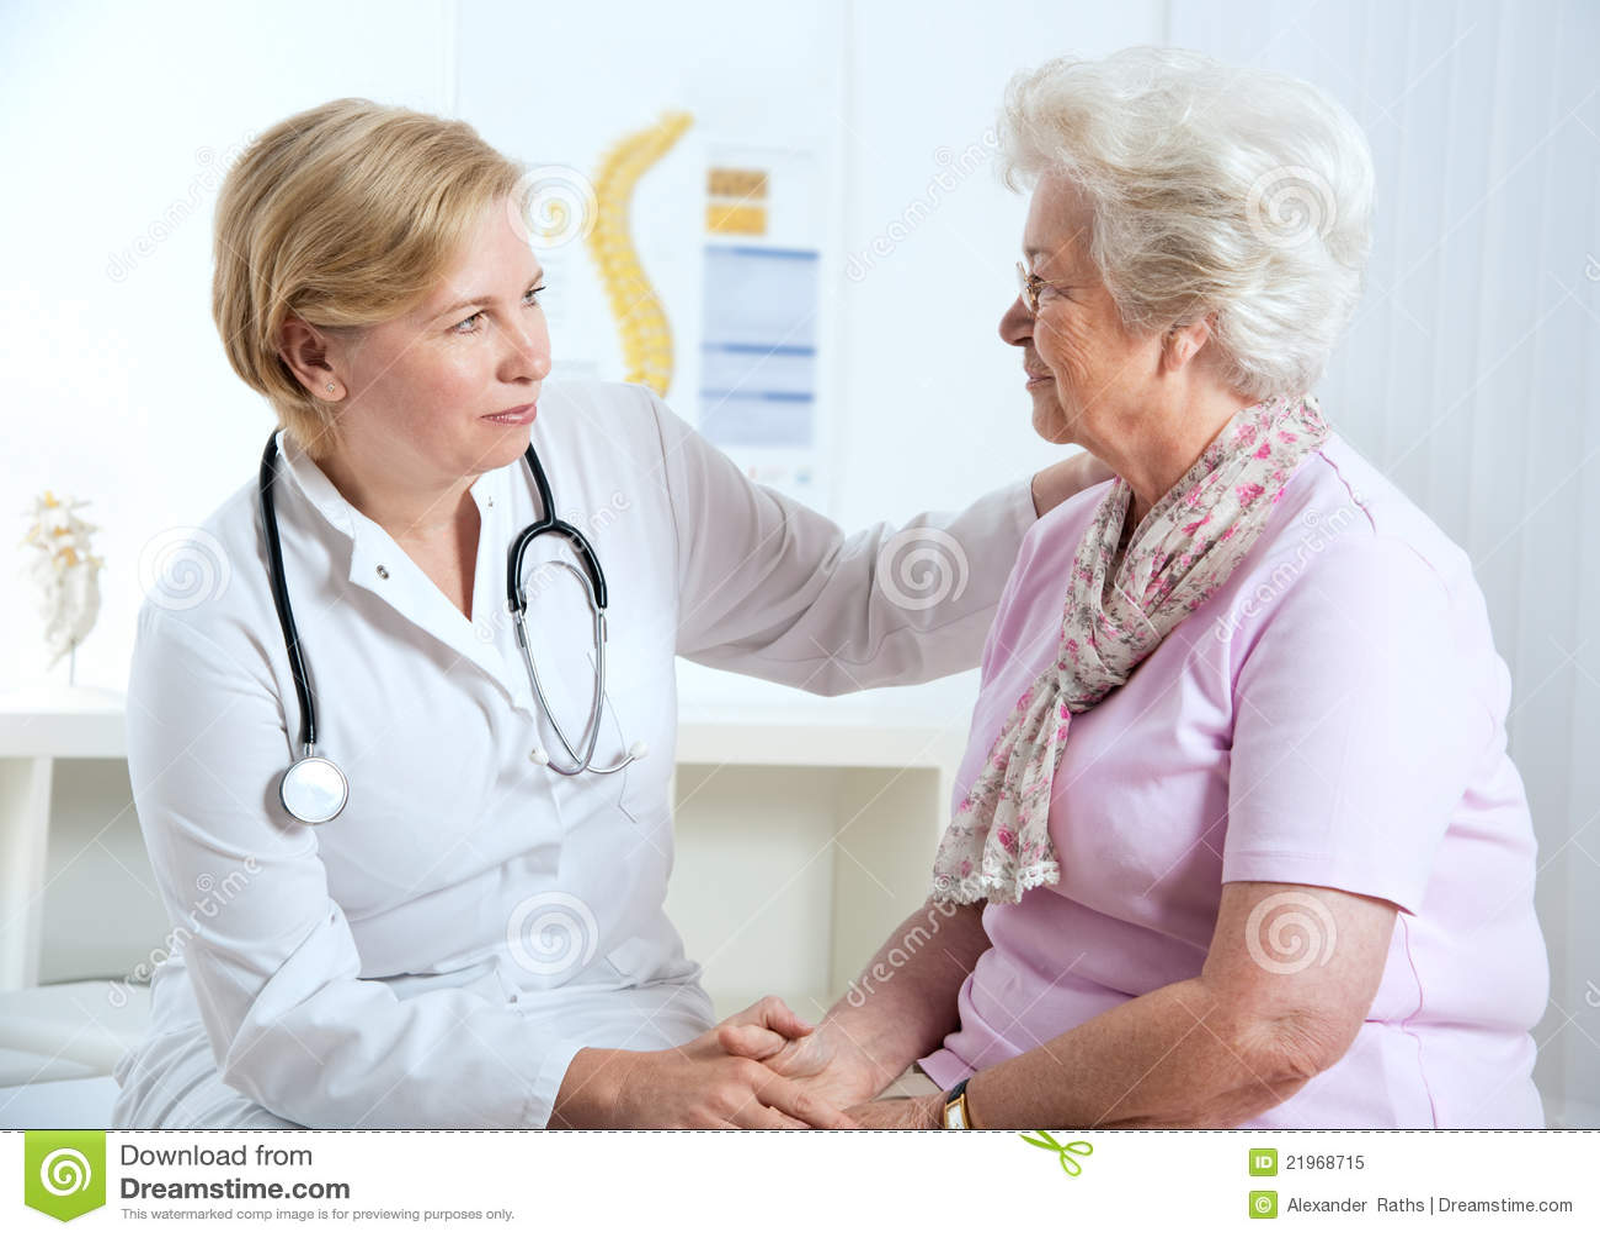 zvezdi-domashnee-doktora-i-patsienti-tanya-porno